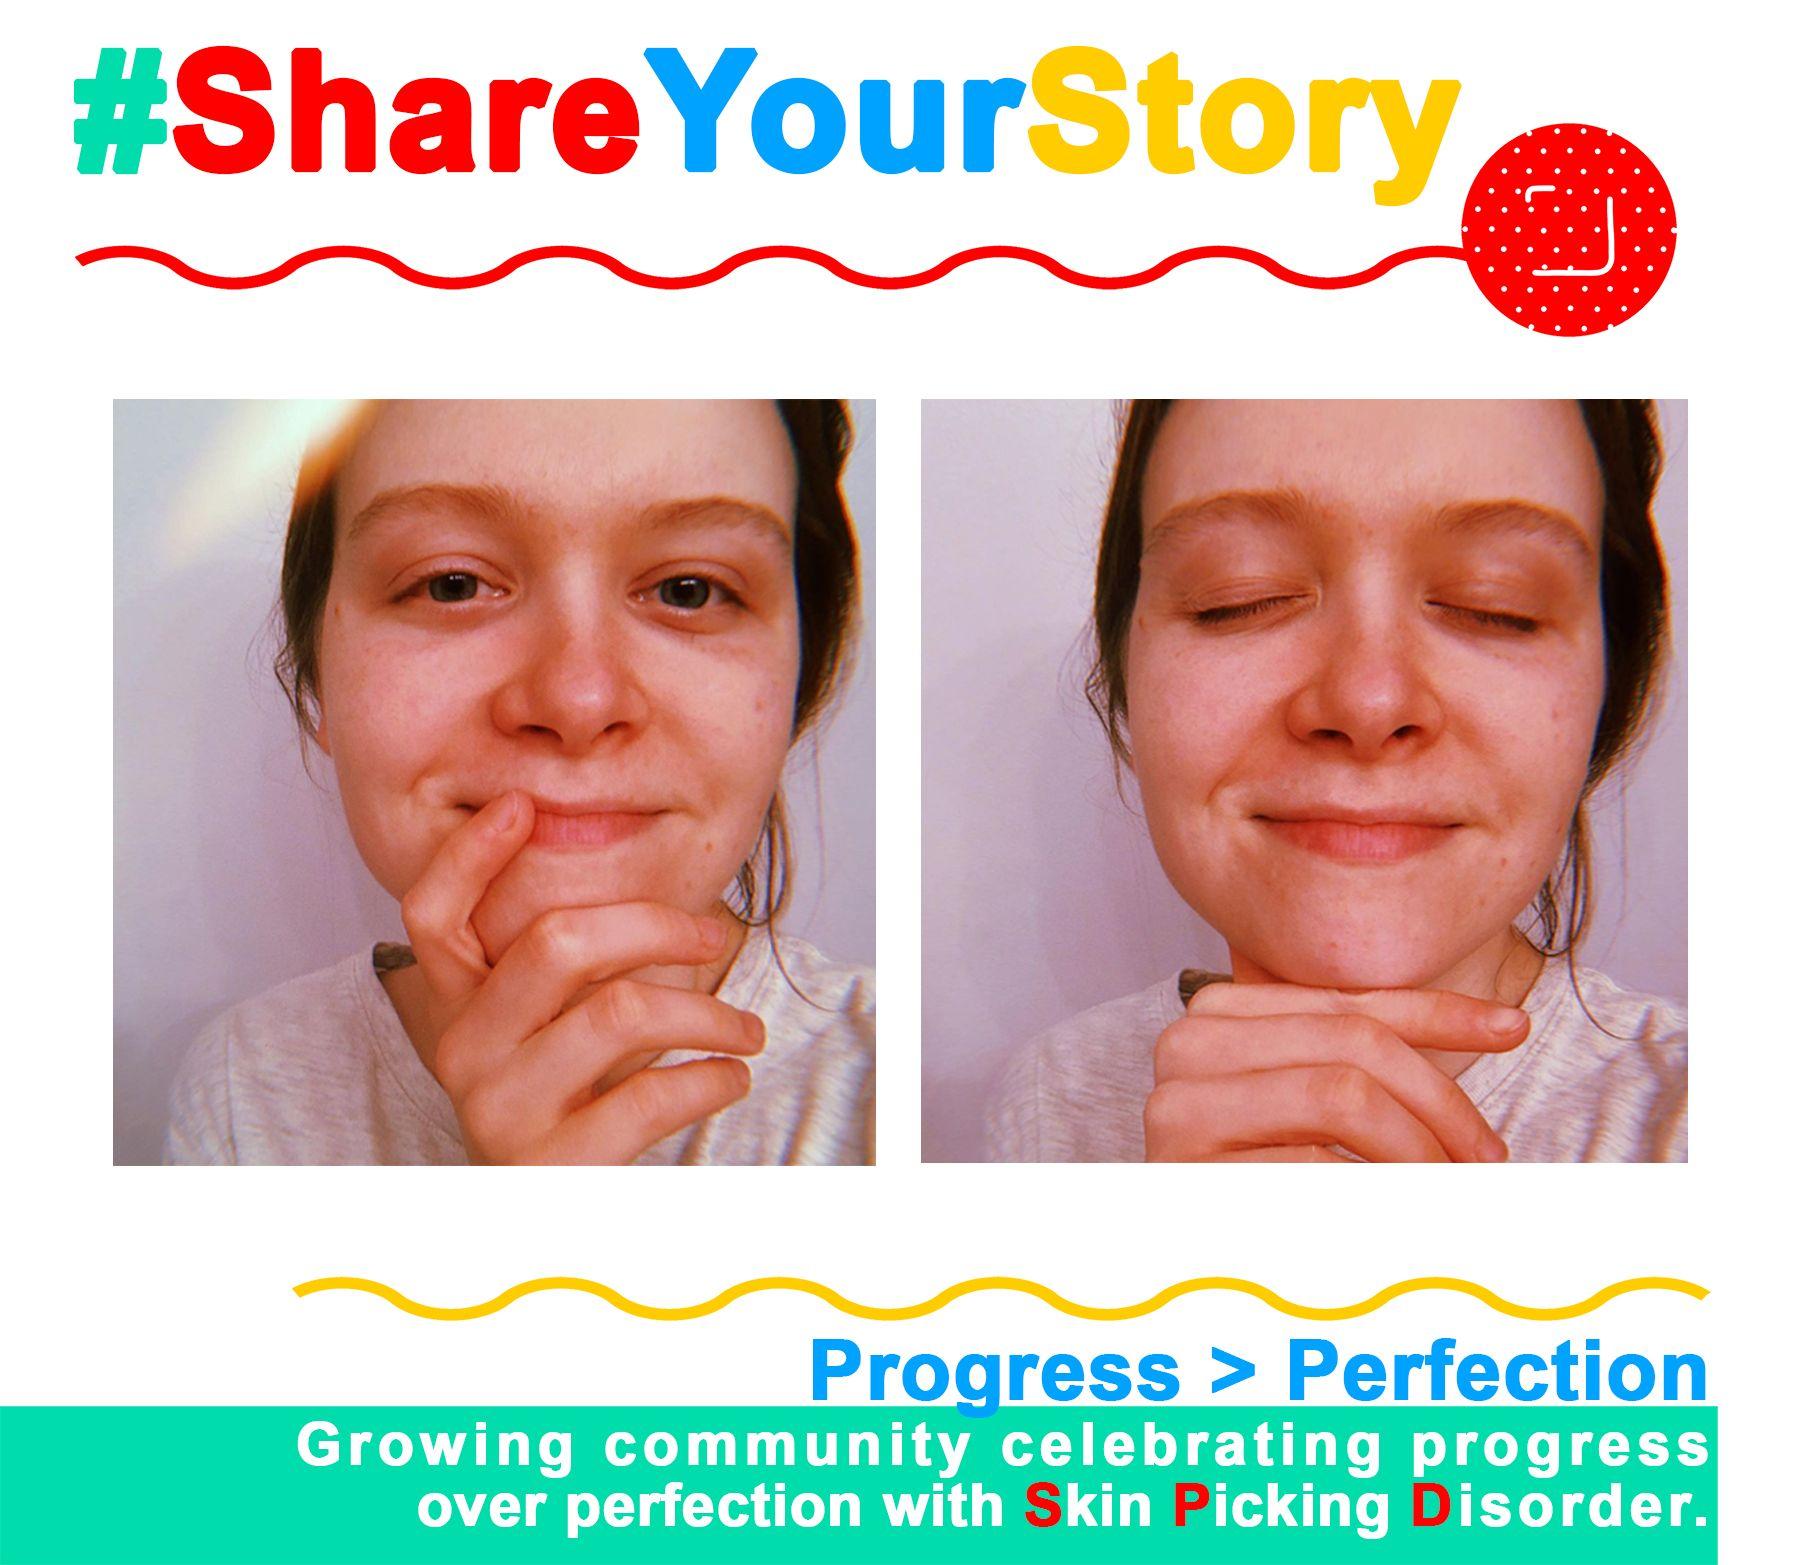 #ShareYourStory: Breanna